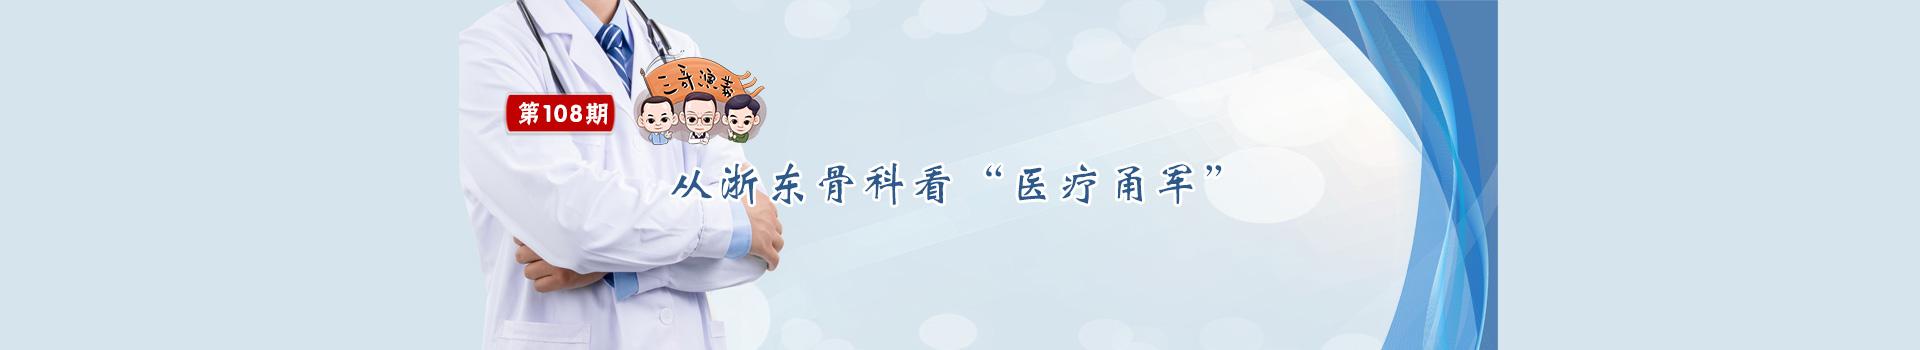 No.108三哥演义